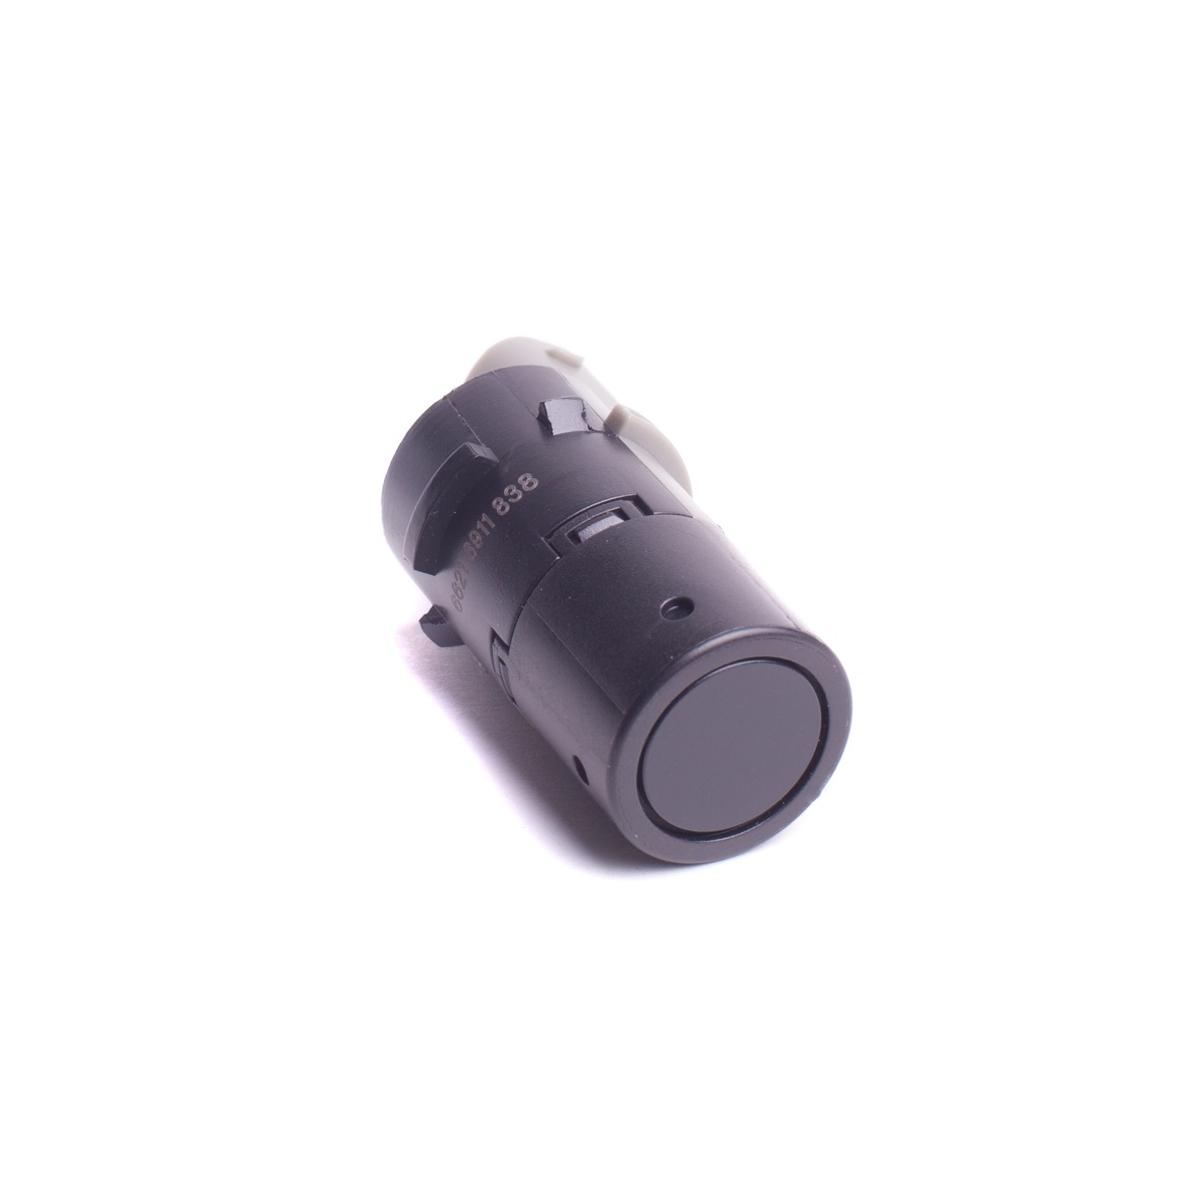 Park sensor 66216911838 for BMW PDC Parktronic